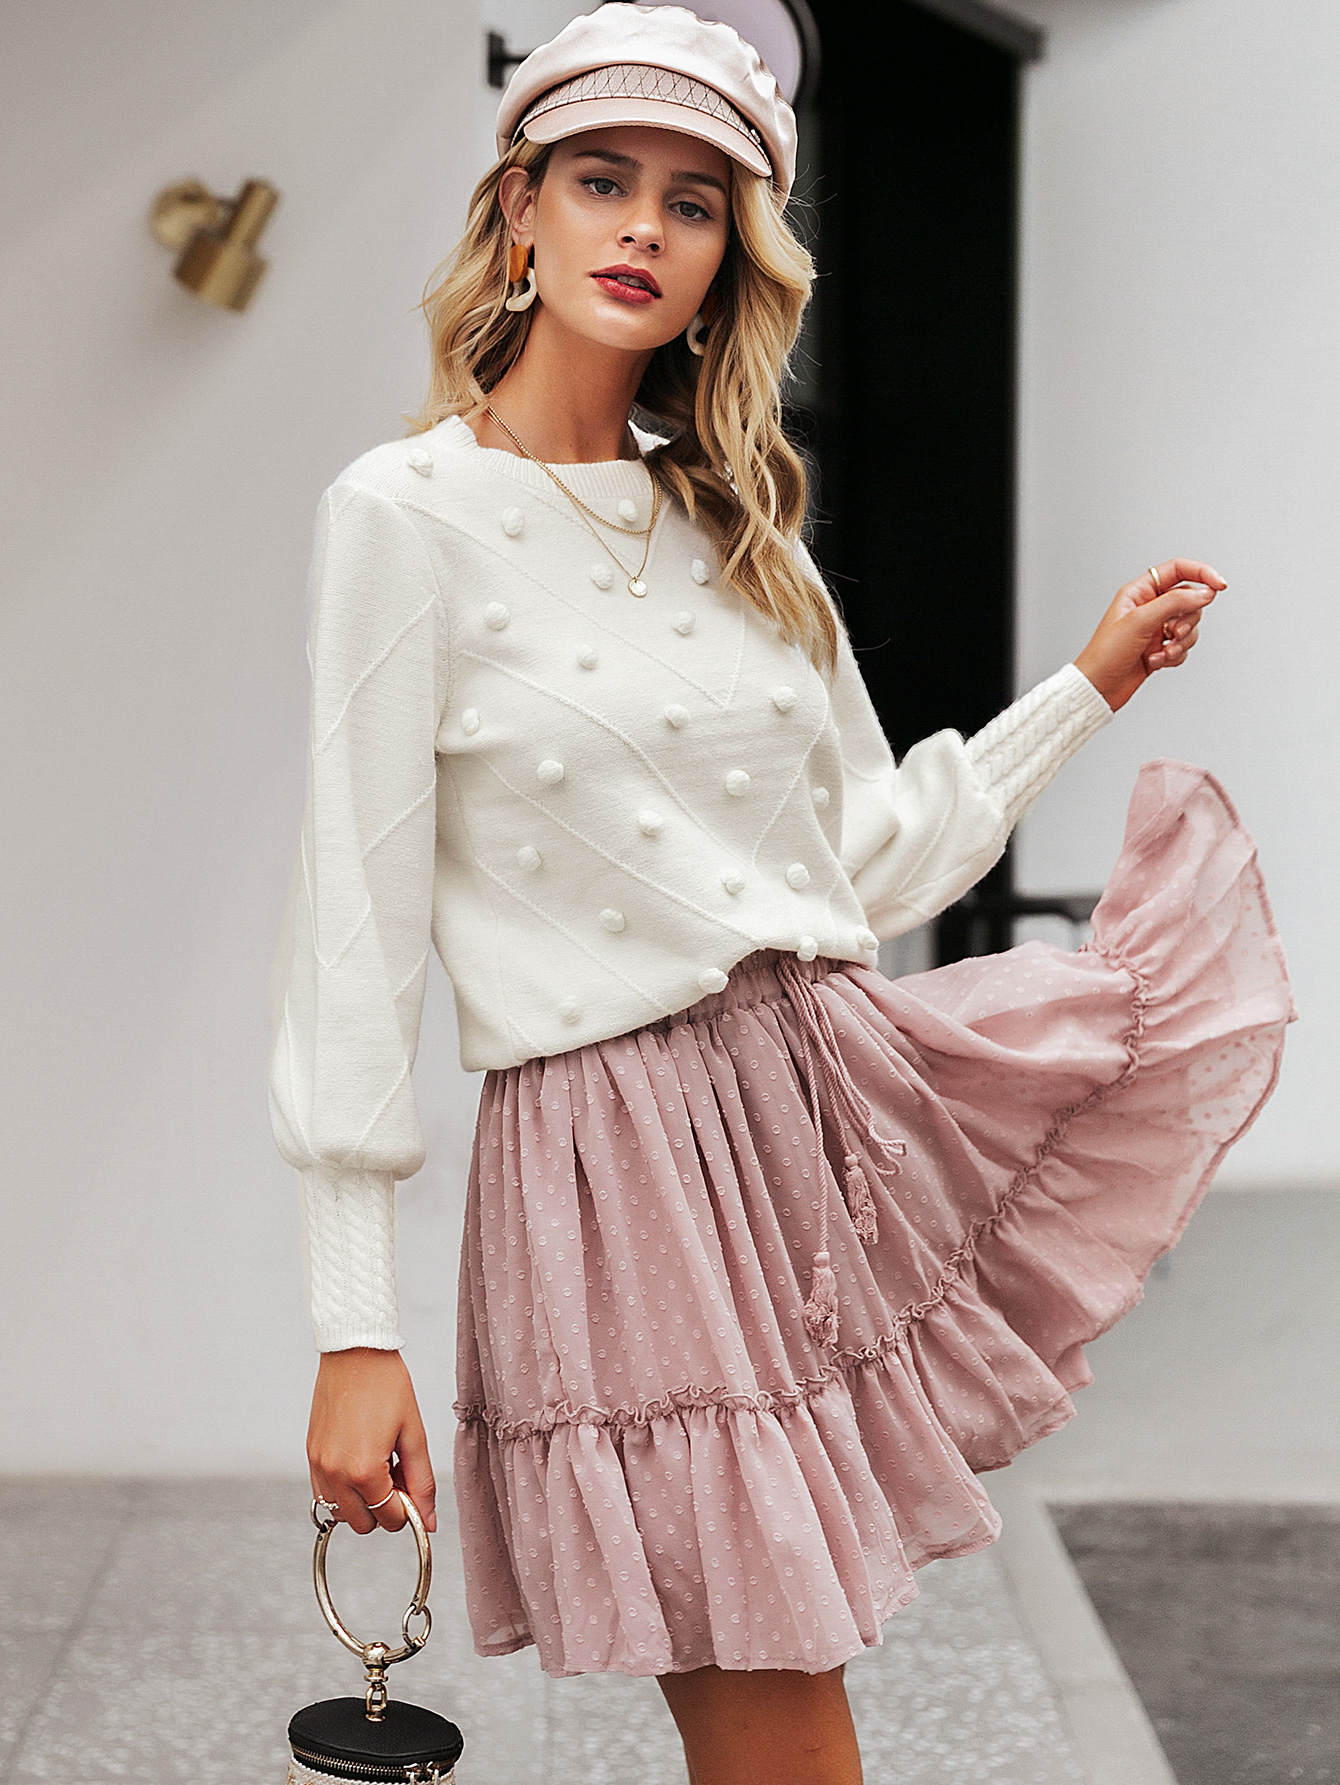 2019 New Skinny Sweater Fashion Women Wholesale NHDE190251